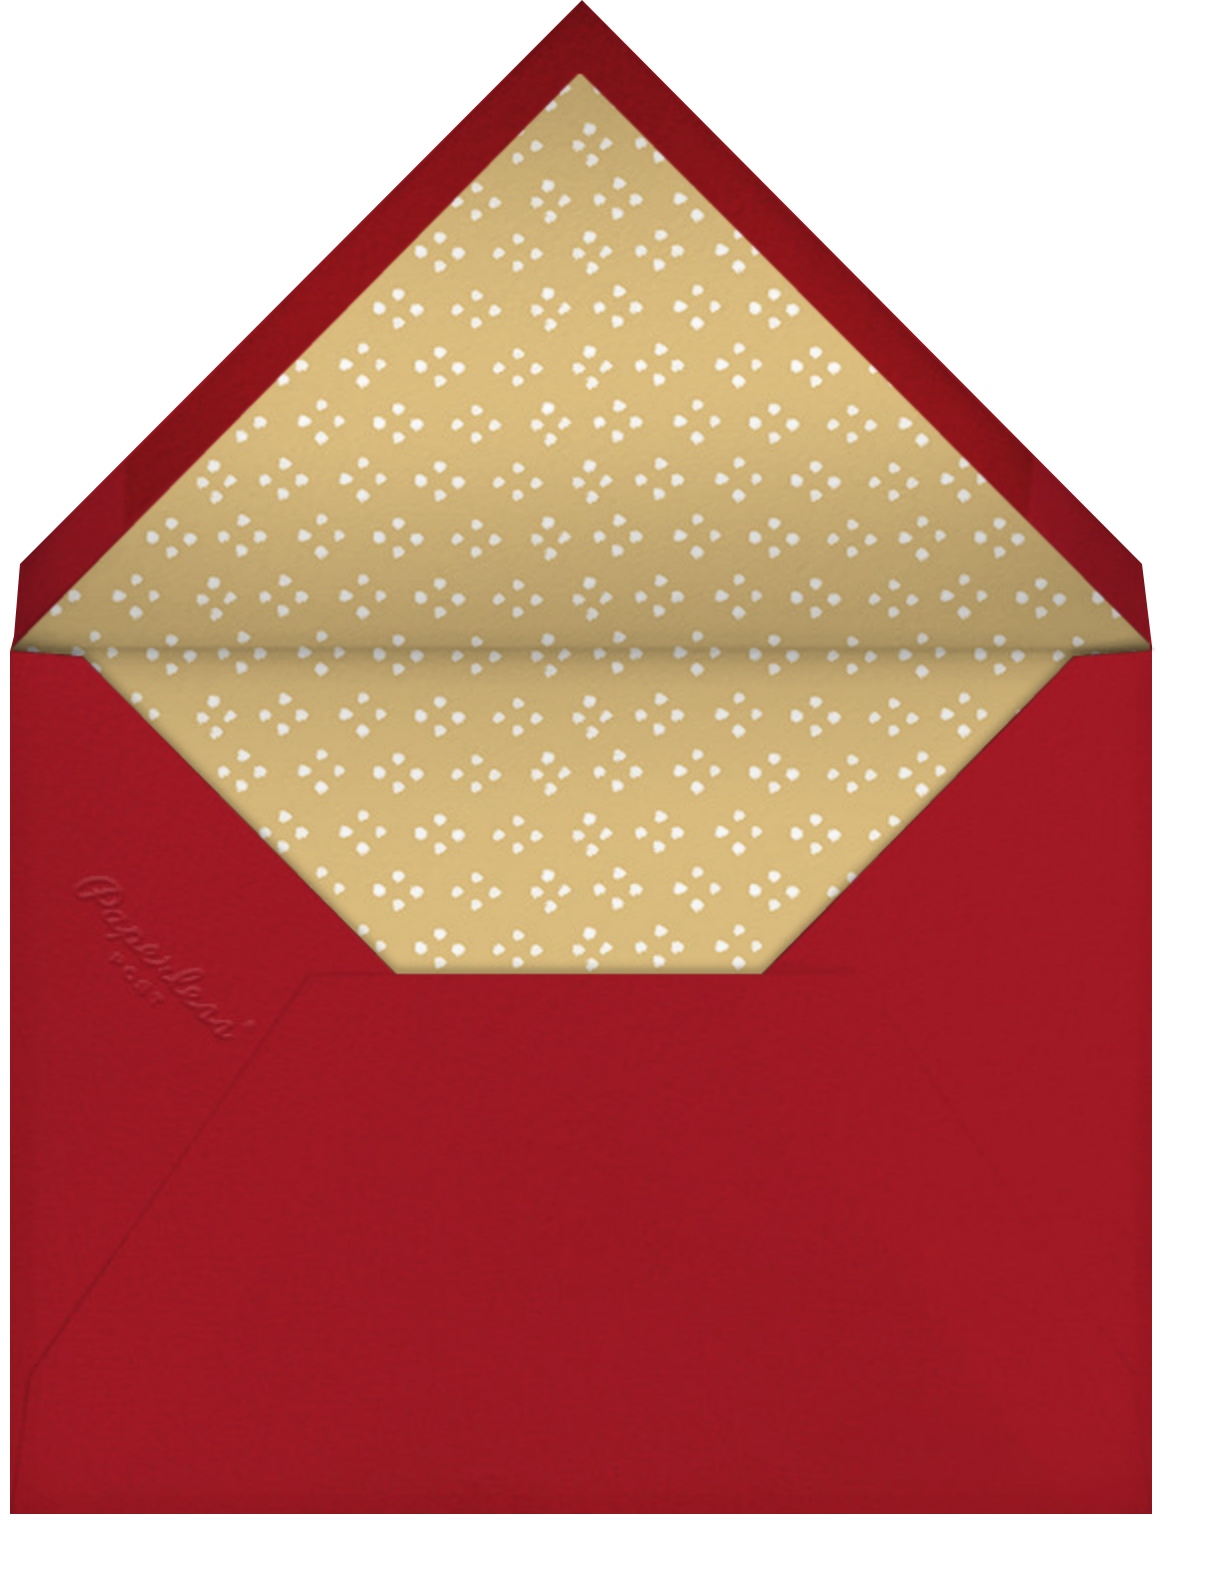 Herald Angel - Medium - Paperless Post - Envelope